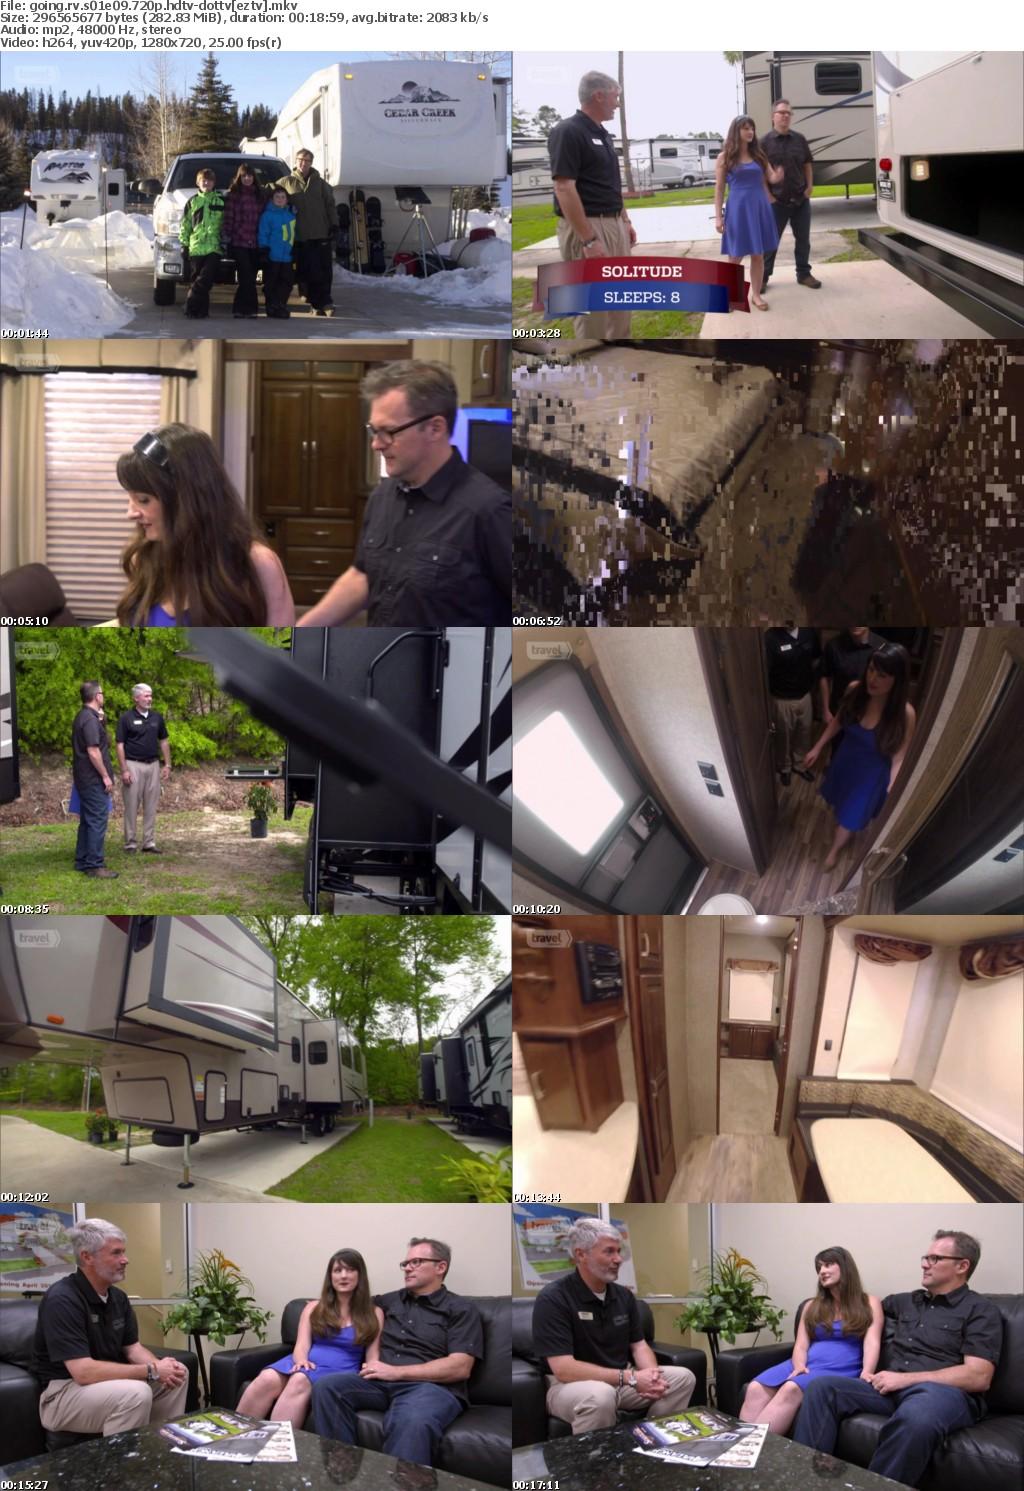 Going RV S01E09 720p HDTV x264-dotTV